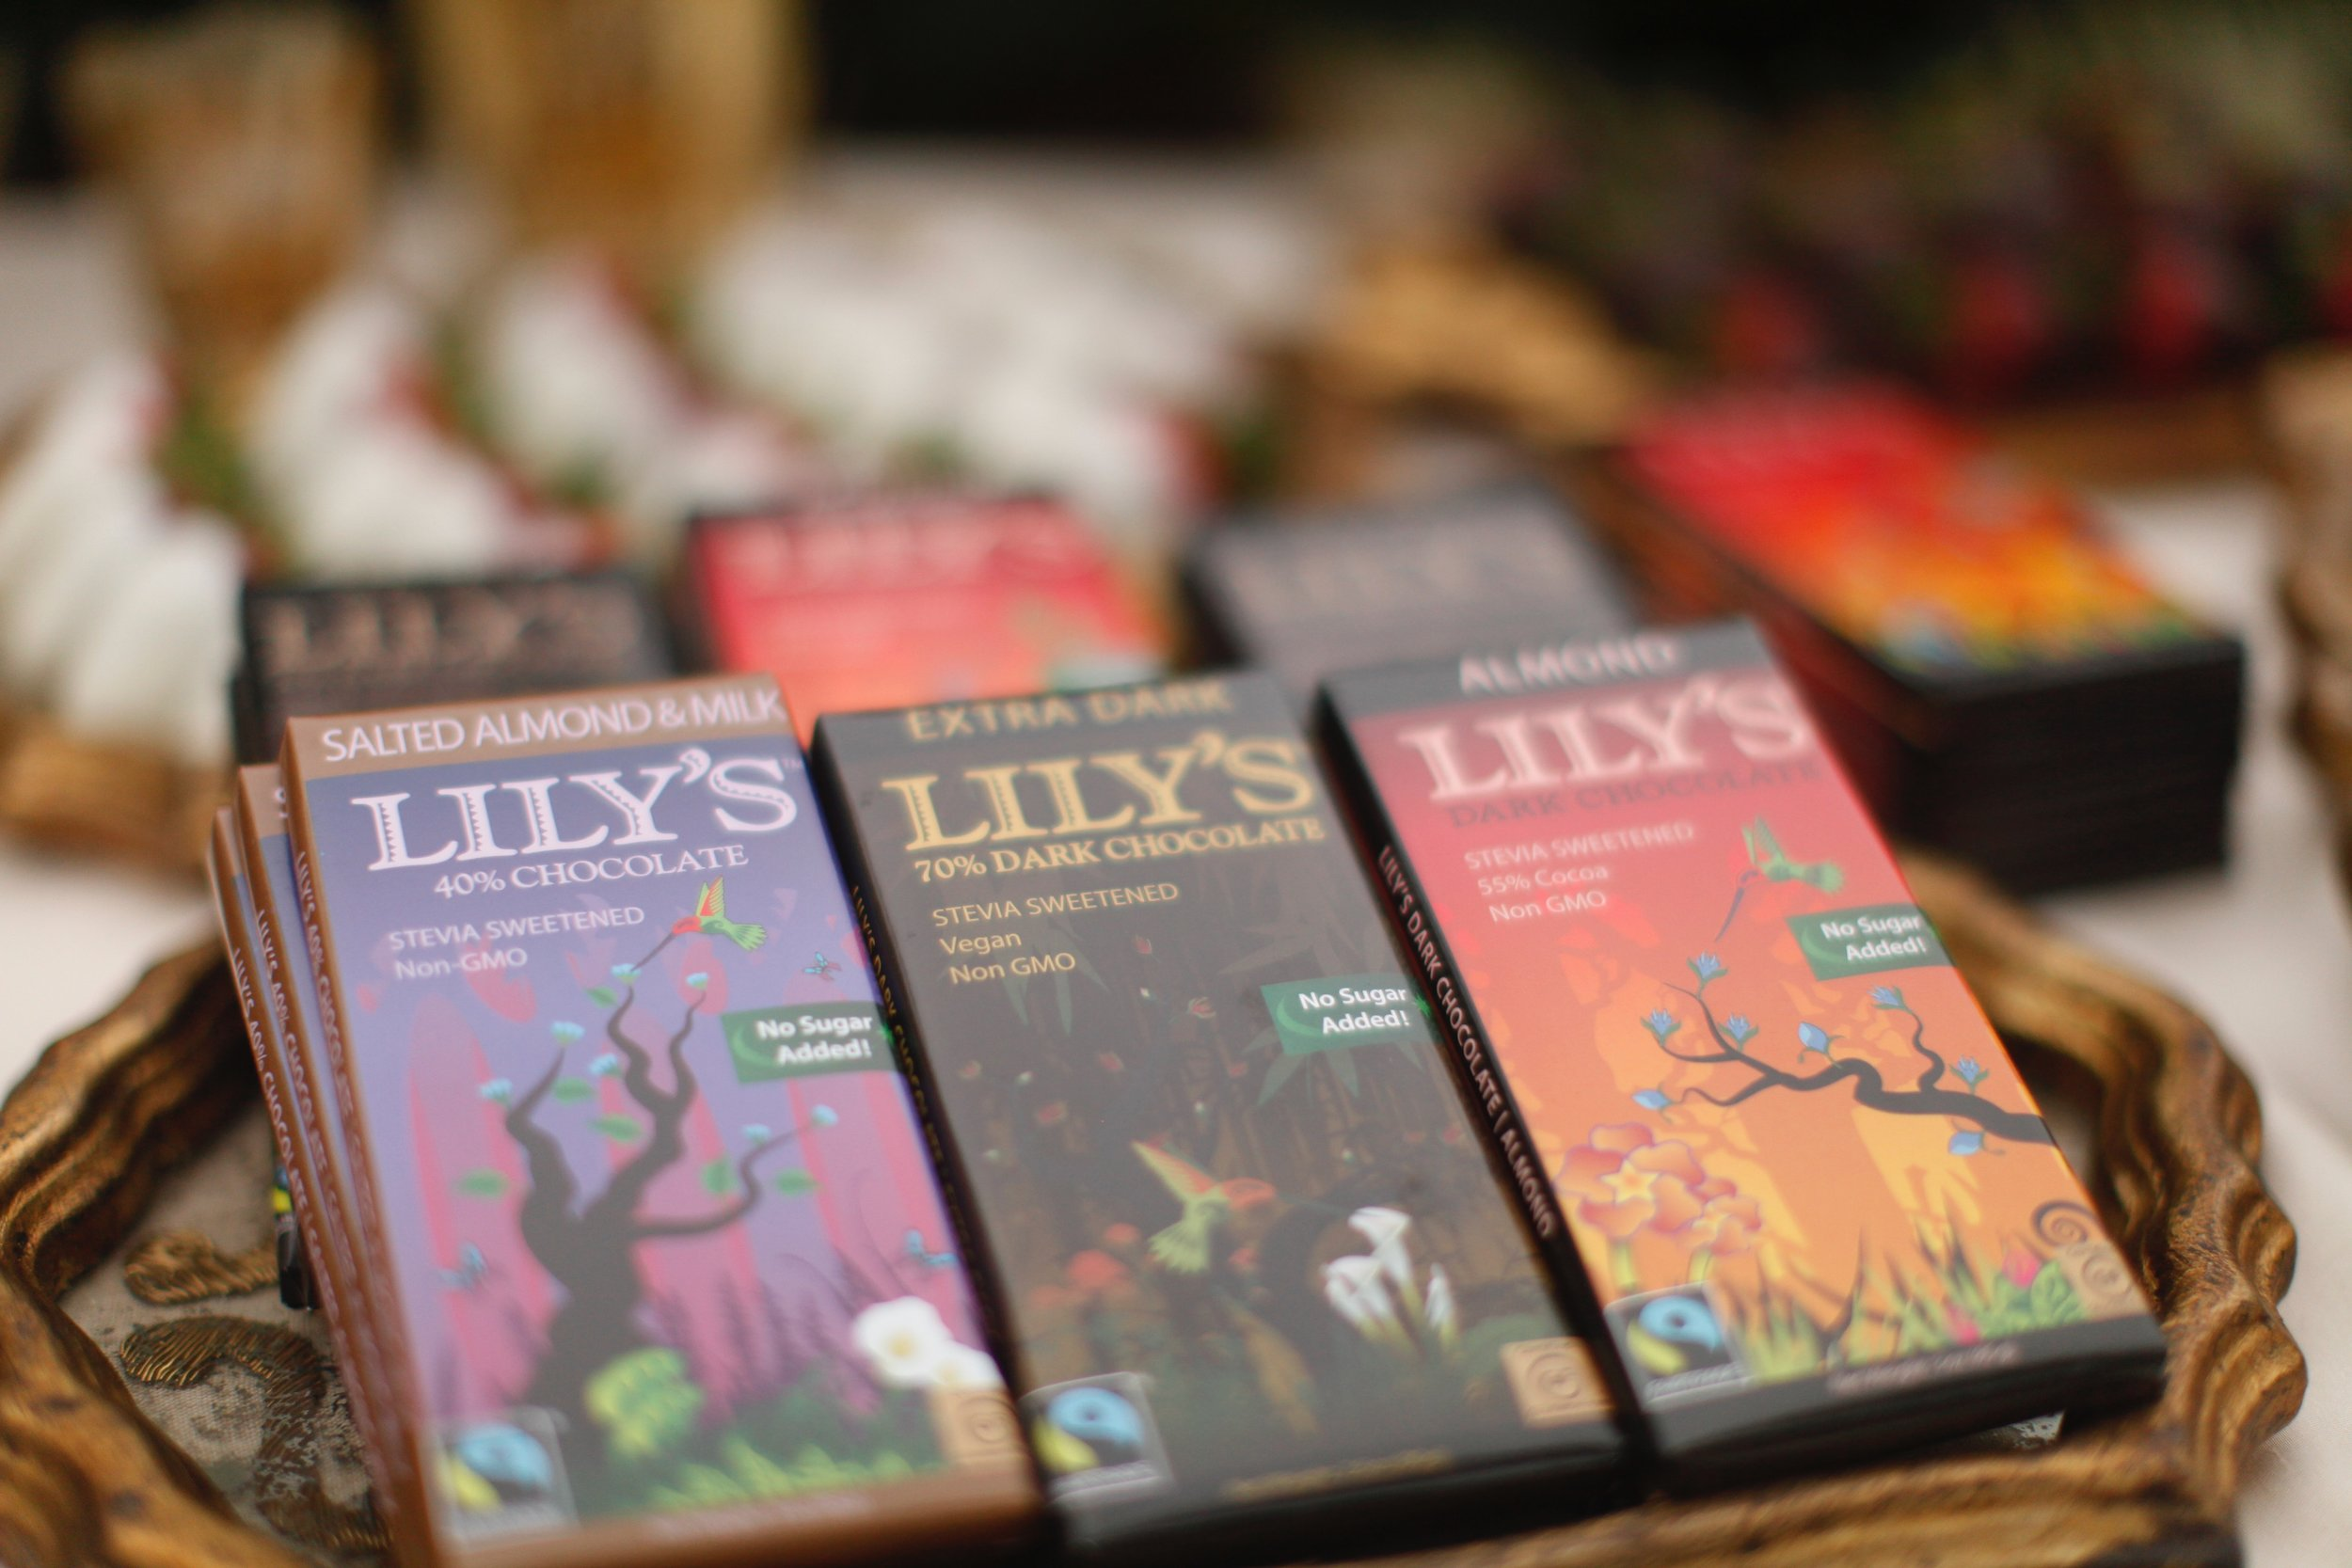 Lily's Sweet Chocolate Bars